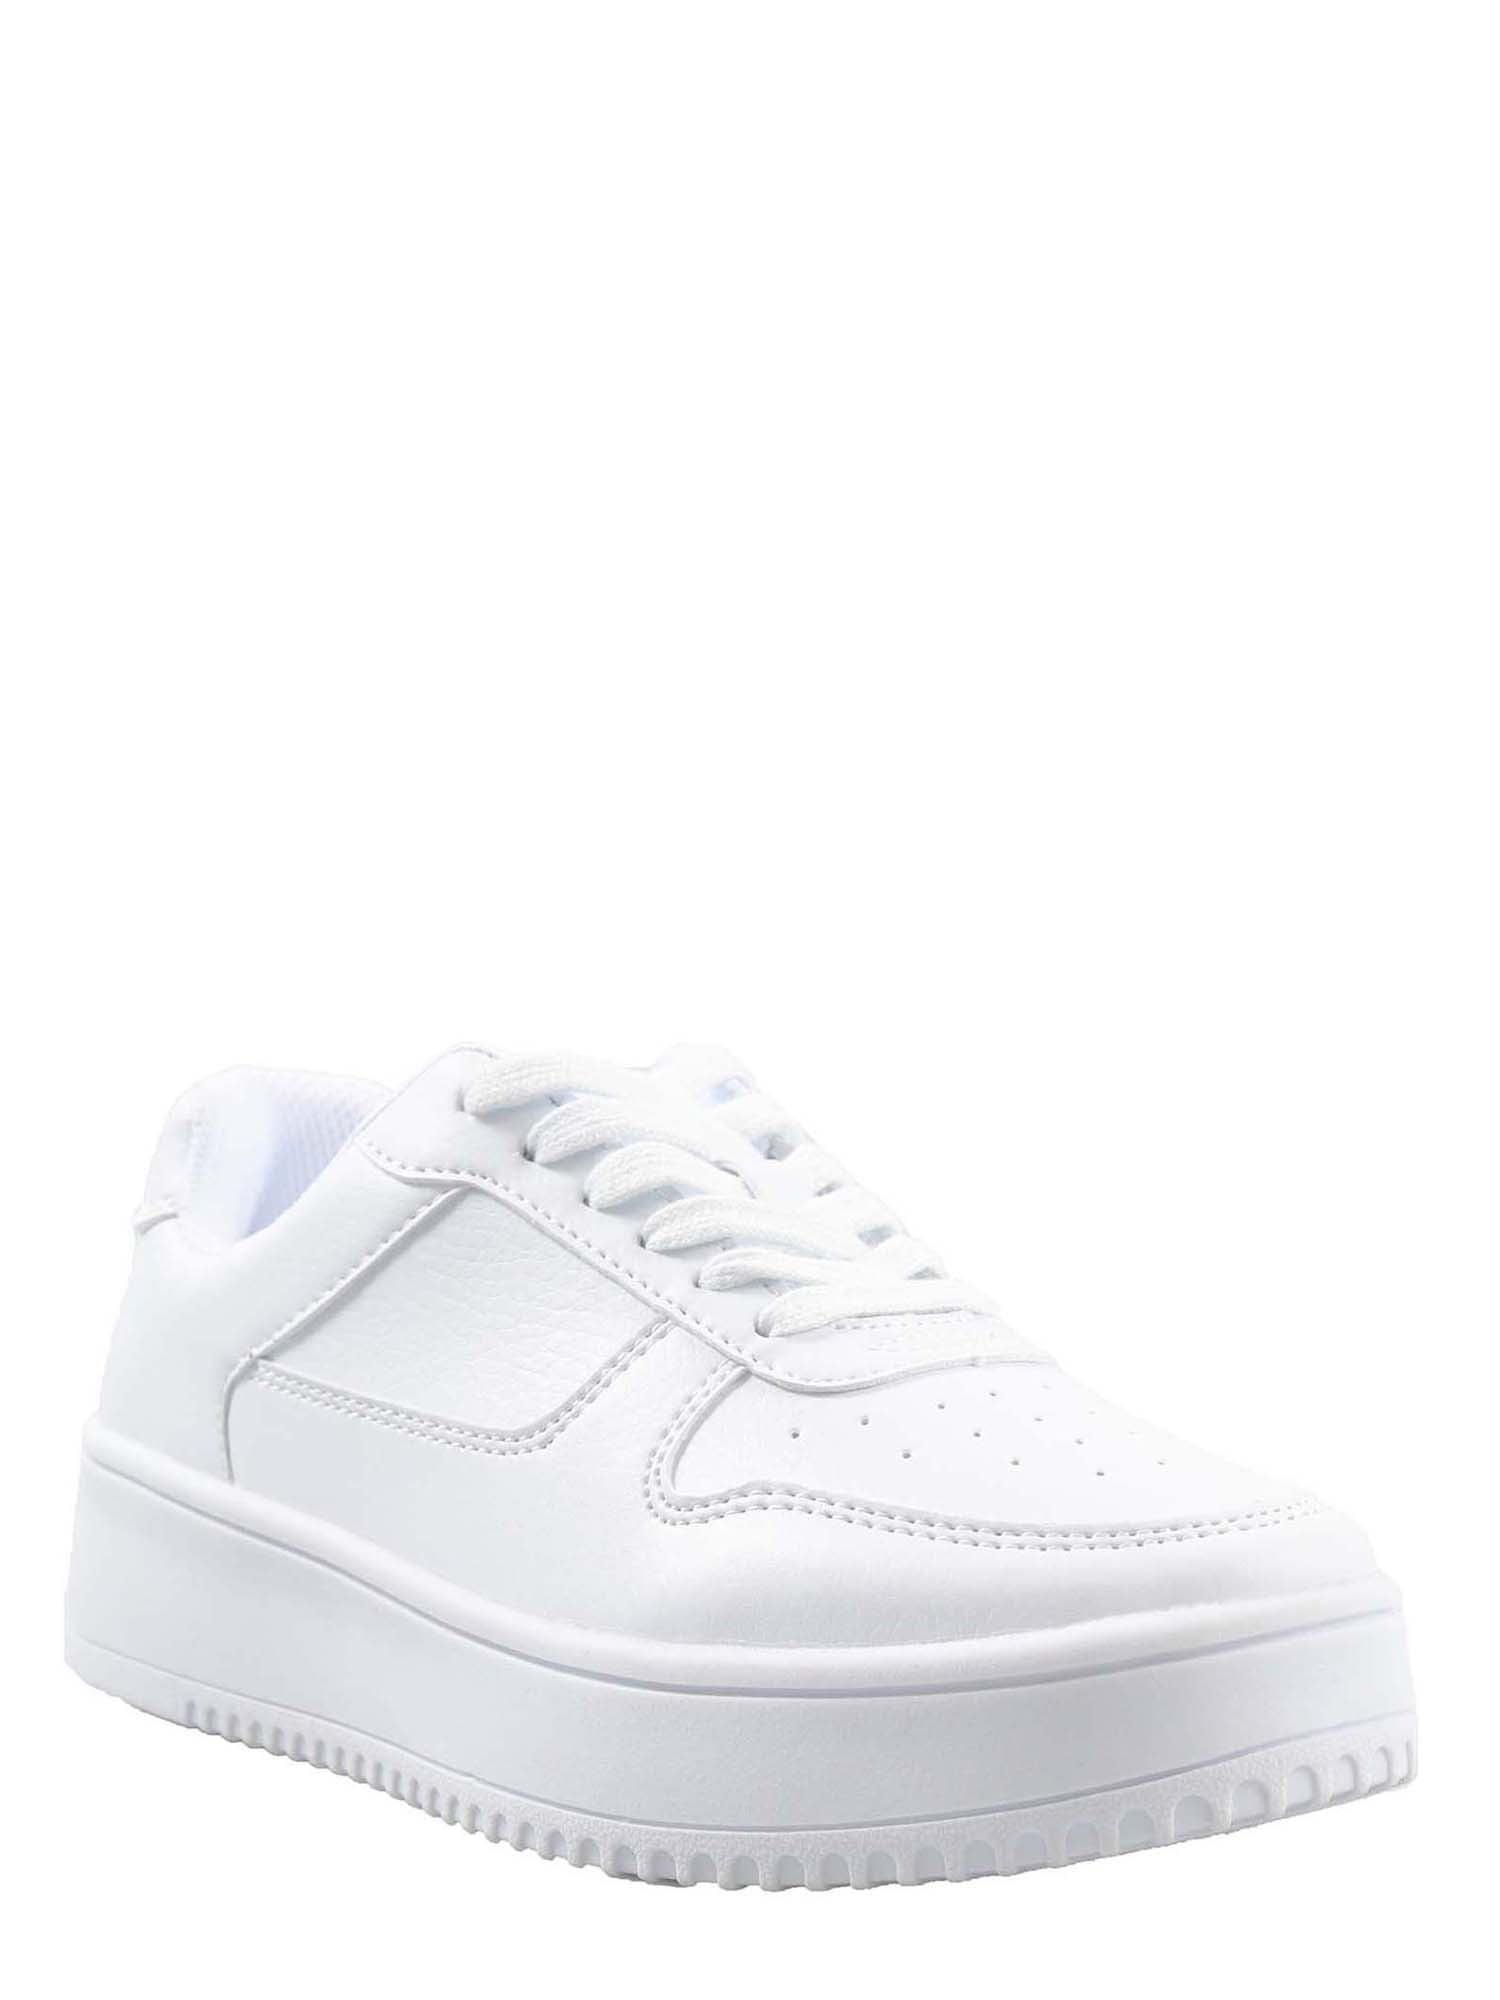 white platform women's sneakers